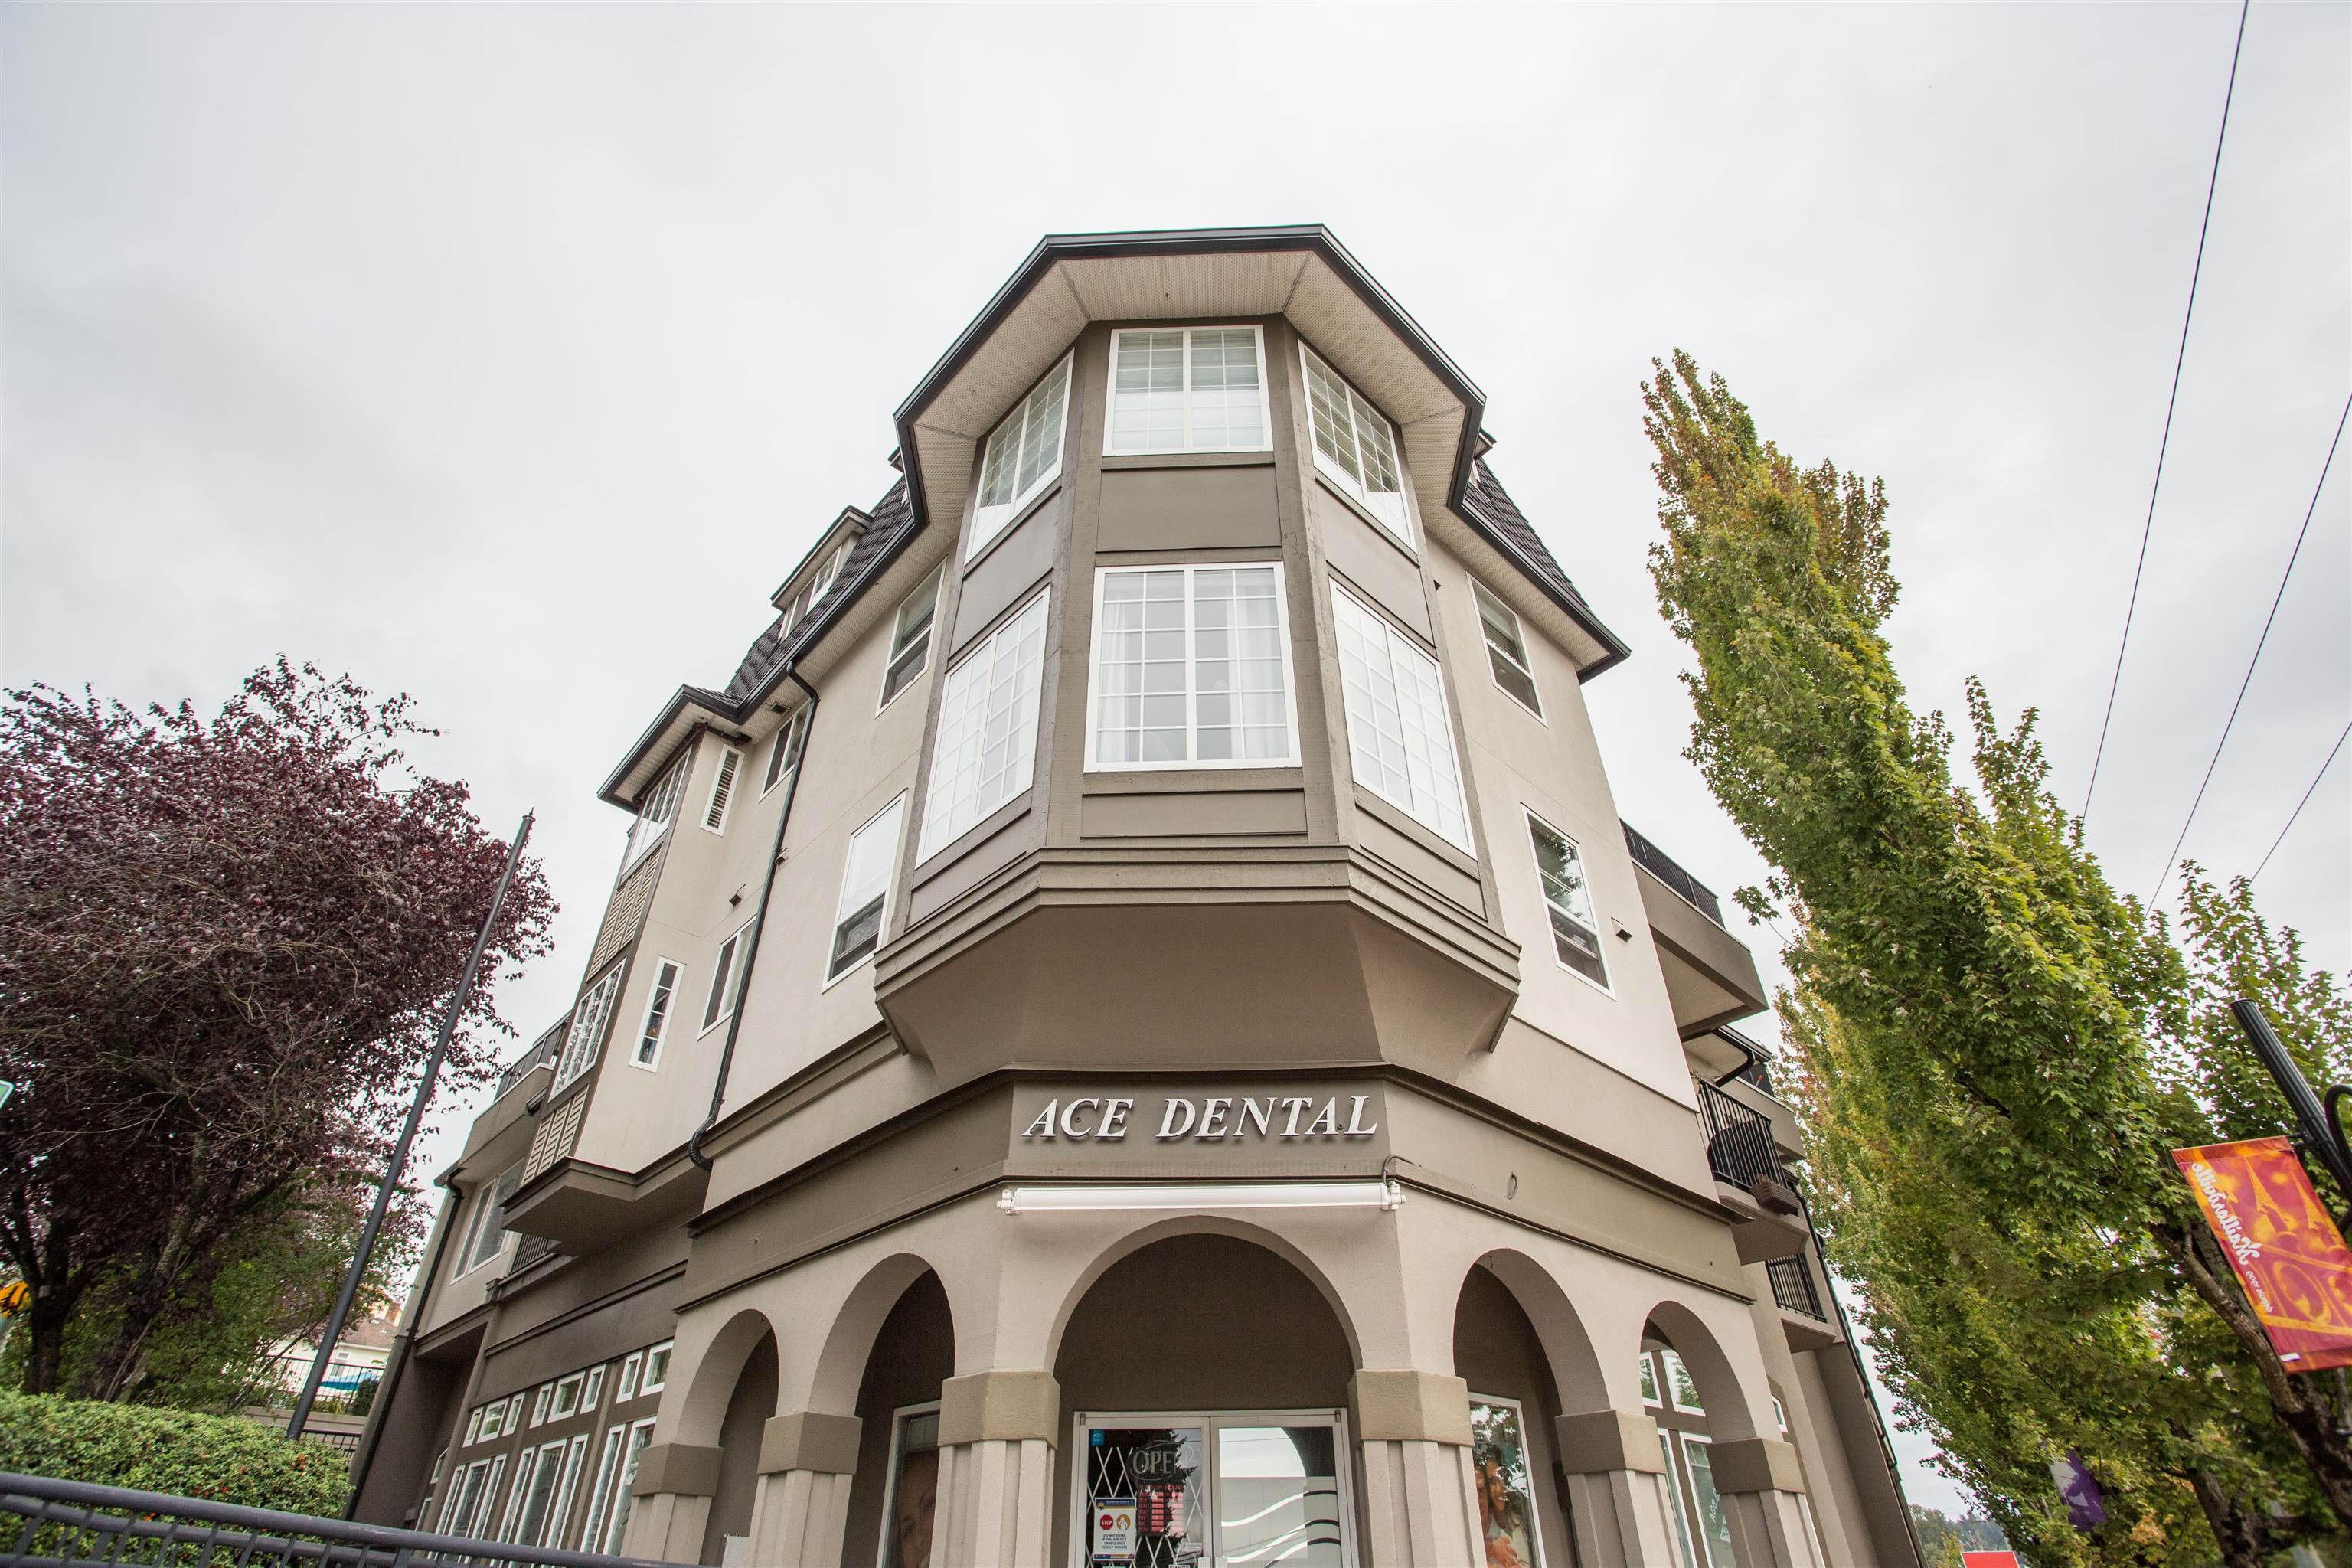 7 205 LEBLEU STREET - Maillardville Apartment/Condo for sale, 3 Bedrooms (R2625671) - #30